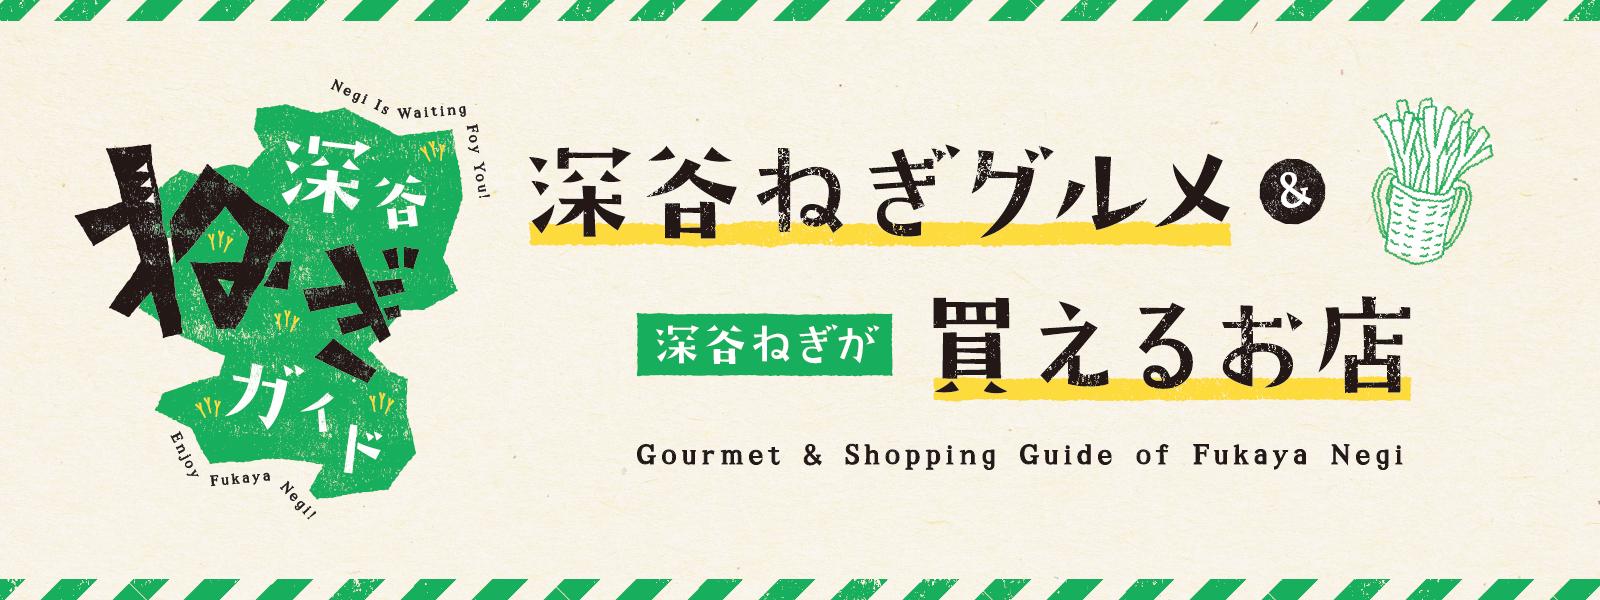 guide_main_pc